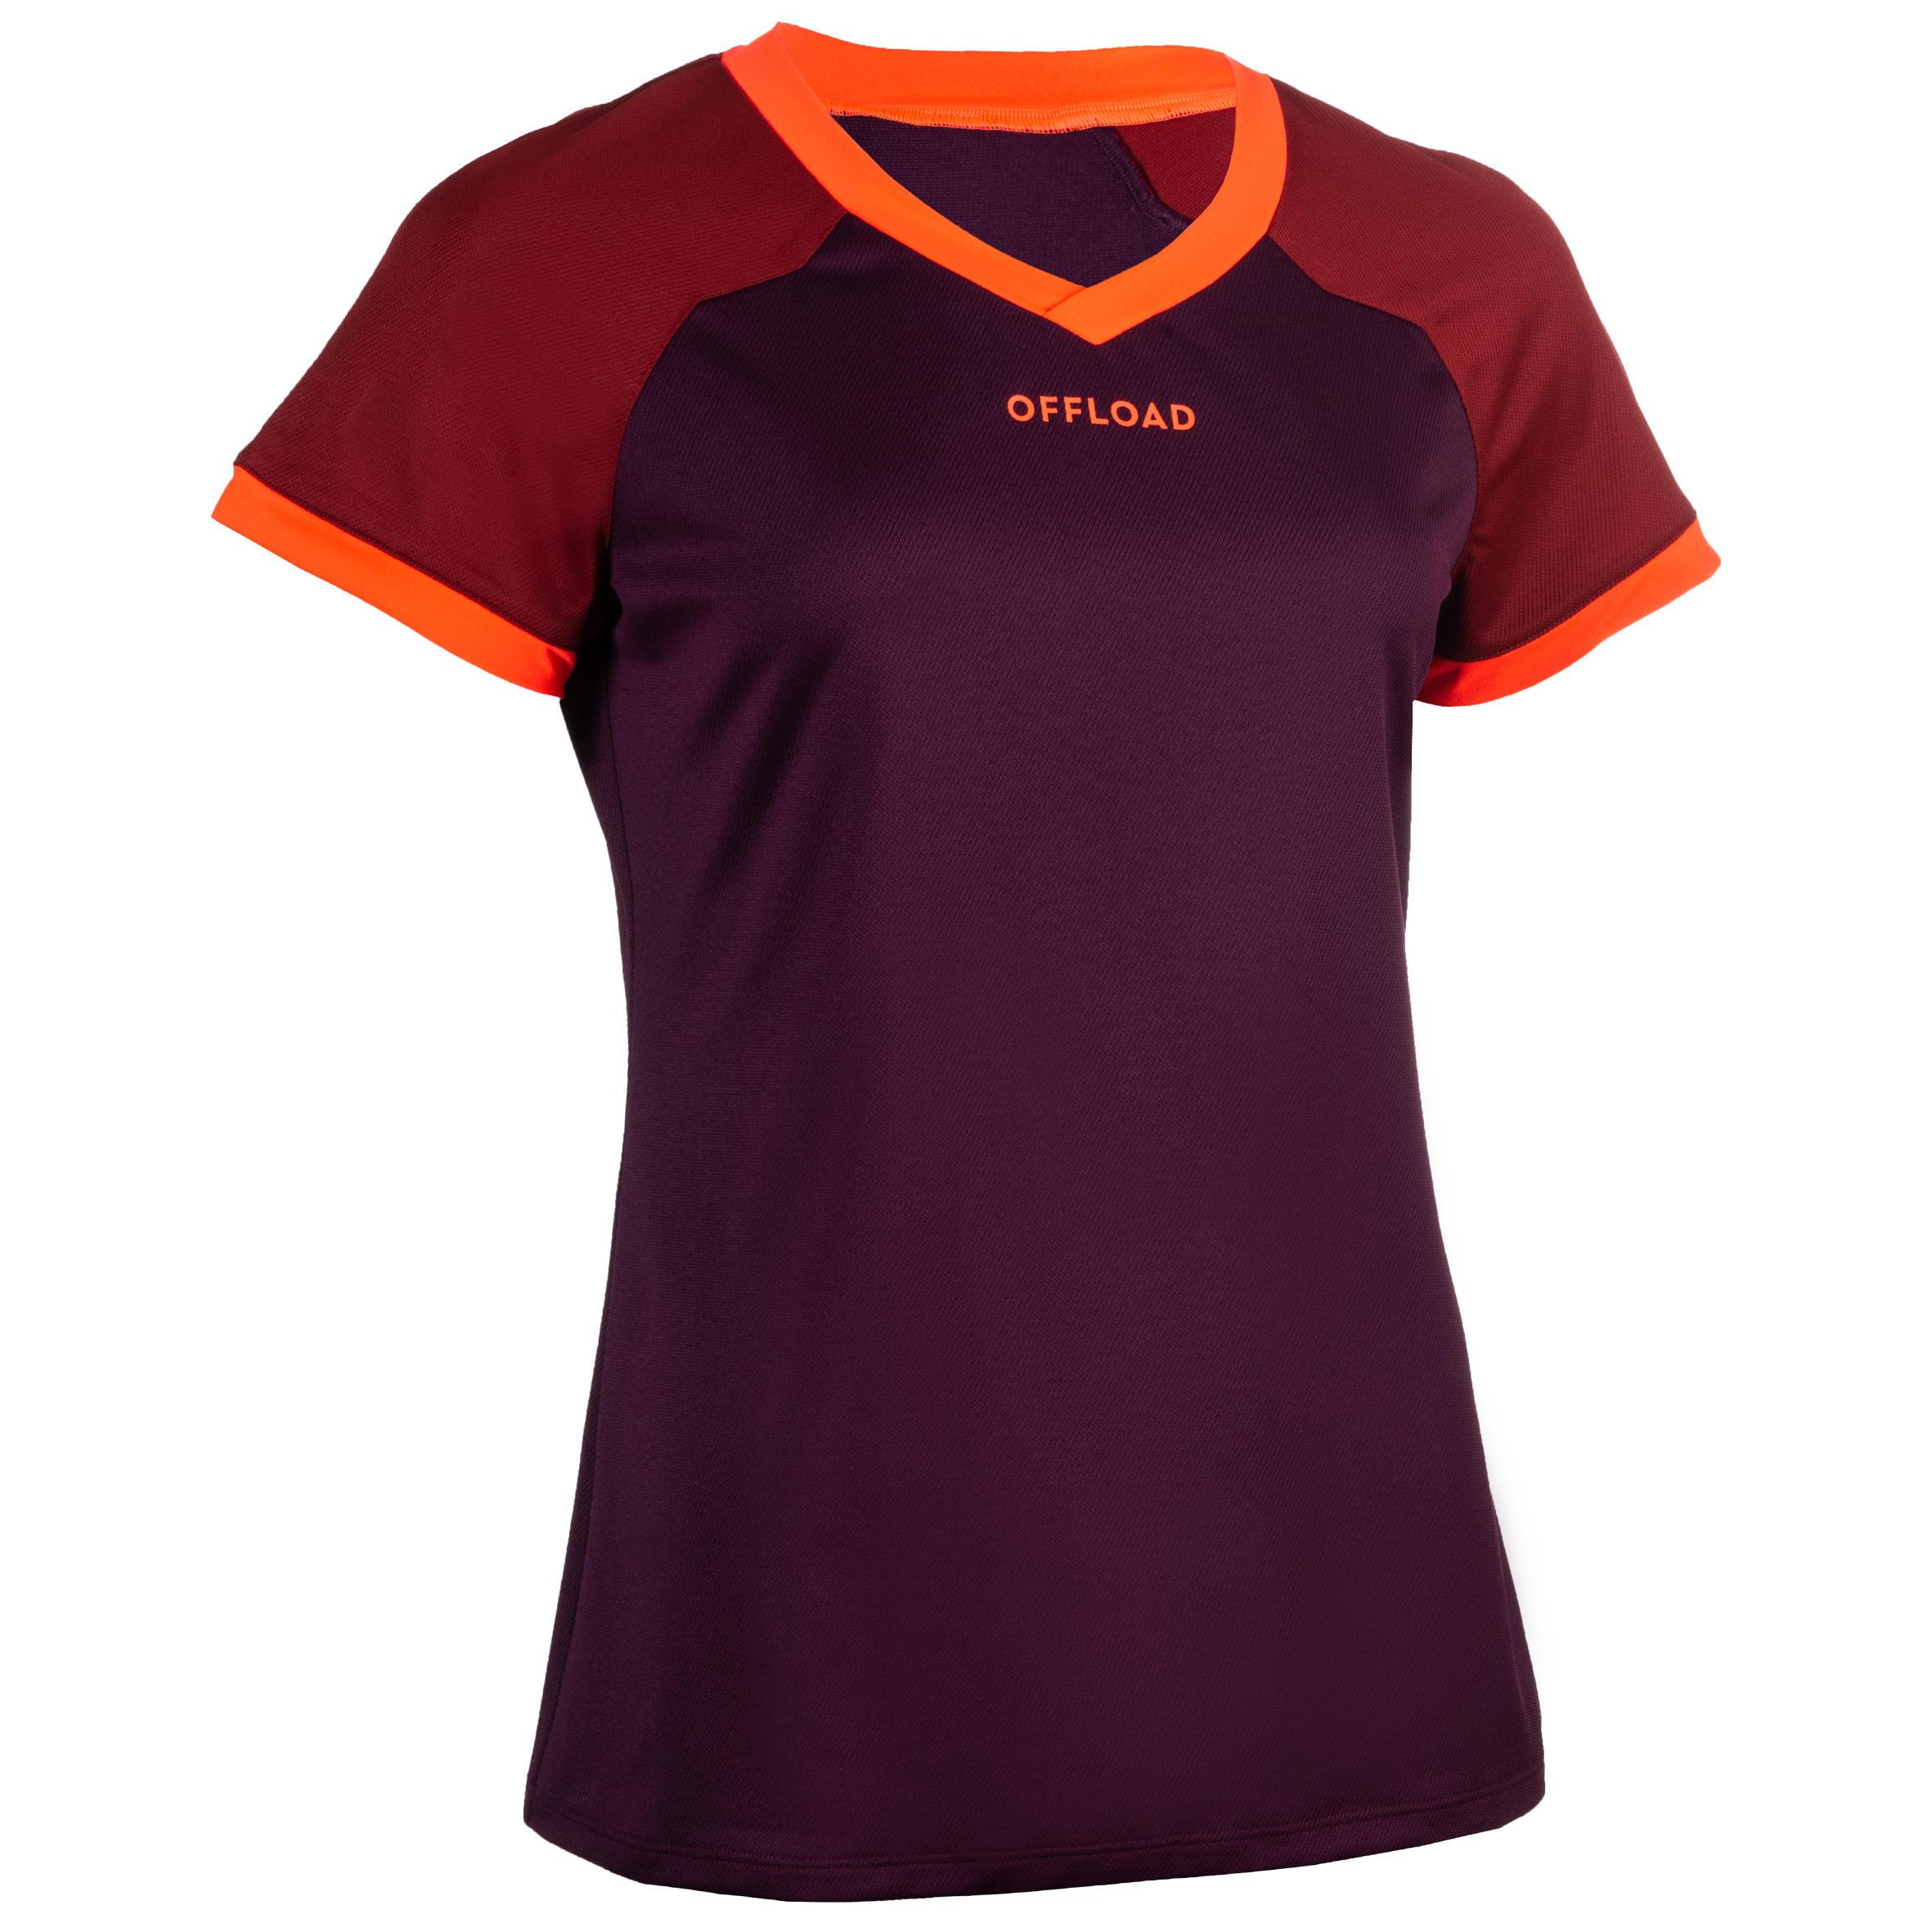 b75d8cbda05 Camisetas de Rugby   Decathlon